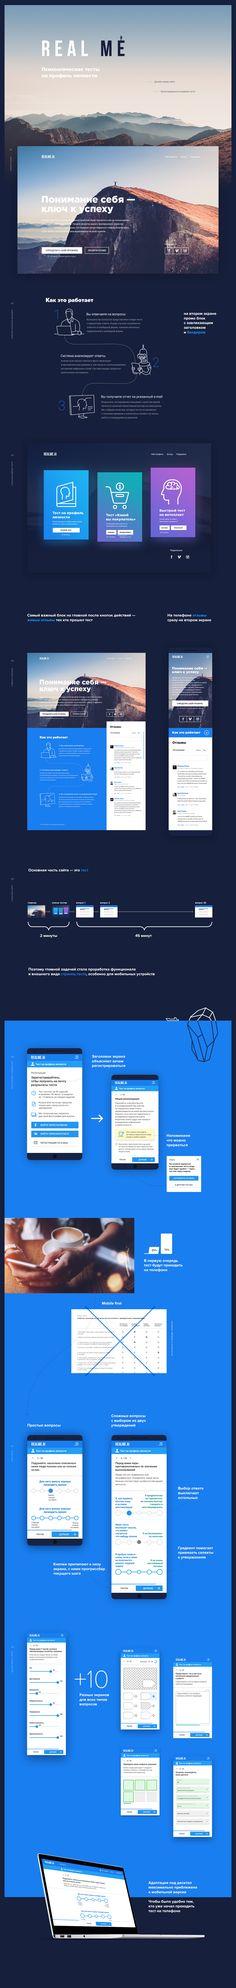 RealMe. Тест на профиль личности, Сайт © ЕвгенийБондковский